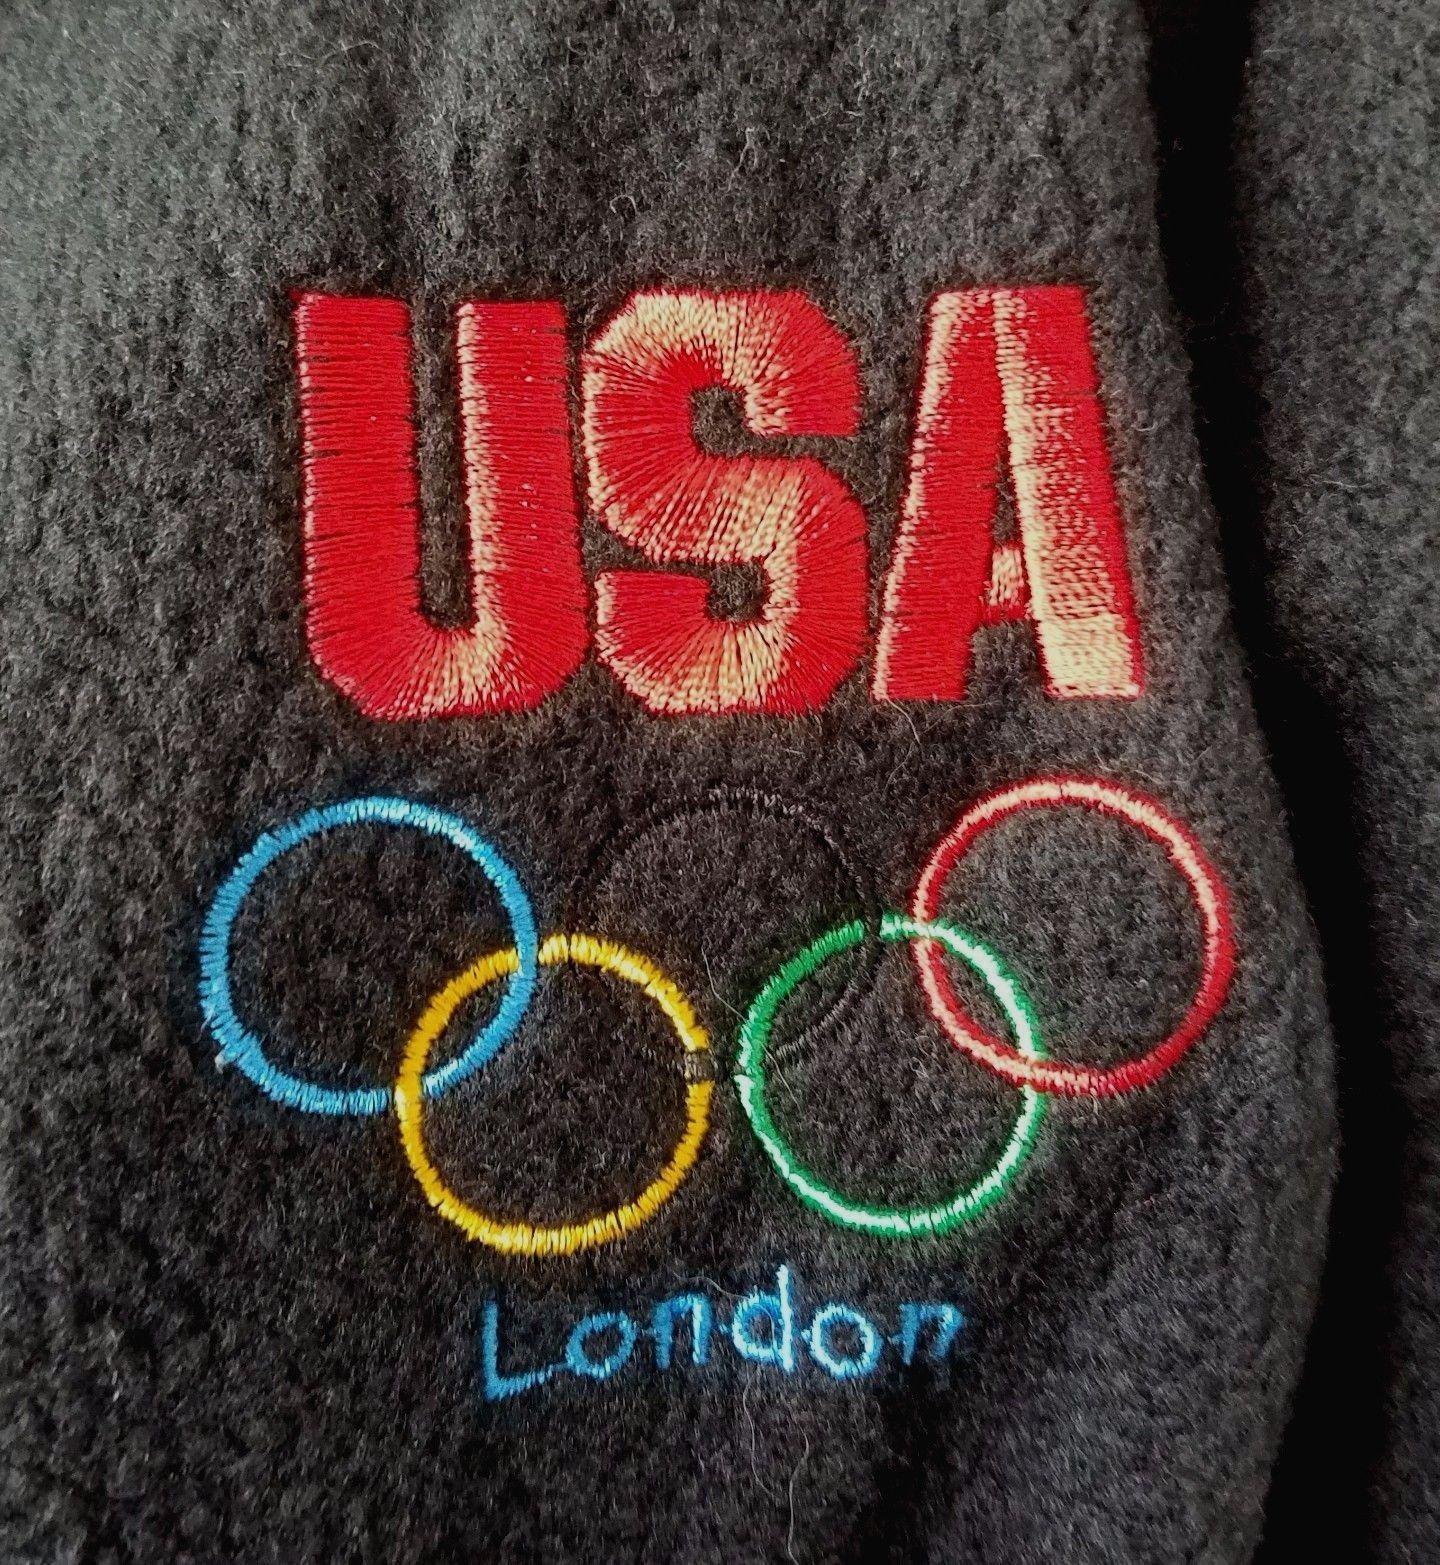 Navy Blue Fleece USA Olympic Committee Jacket London Size L